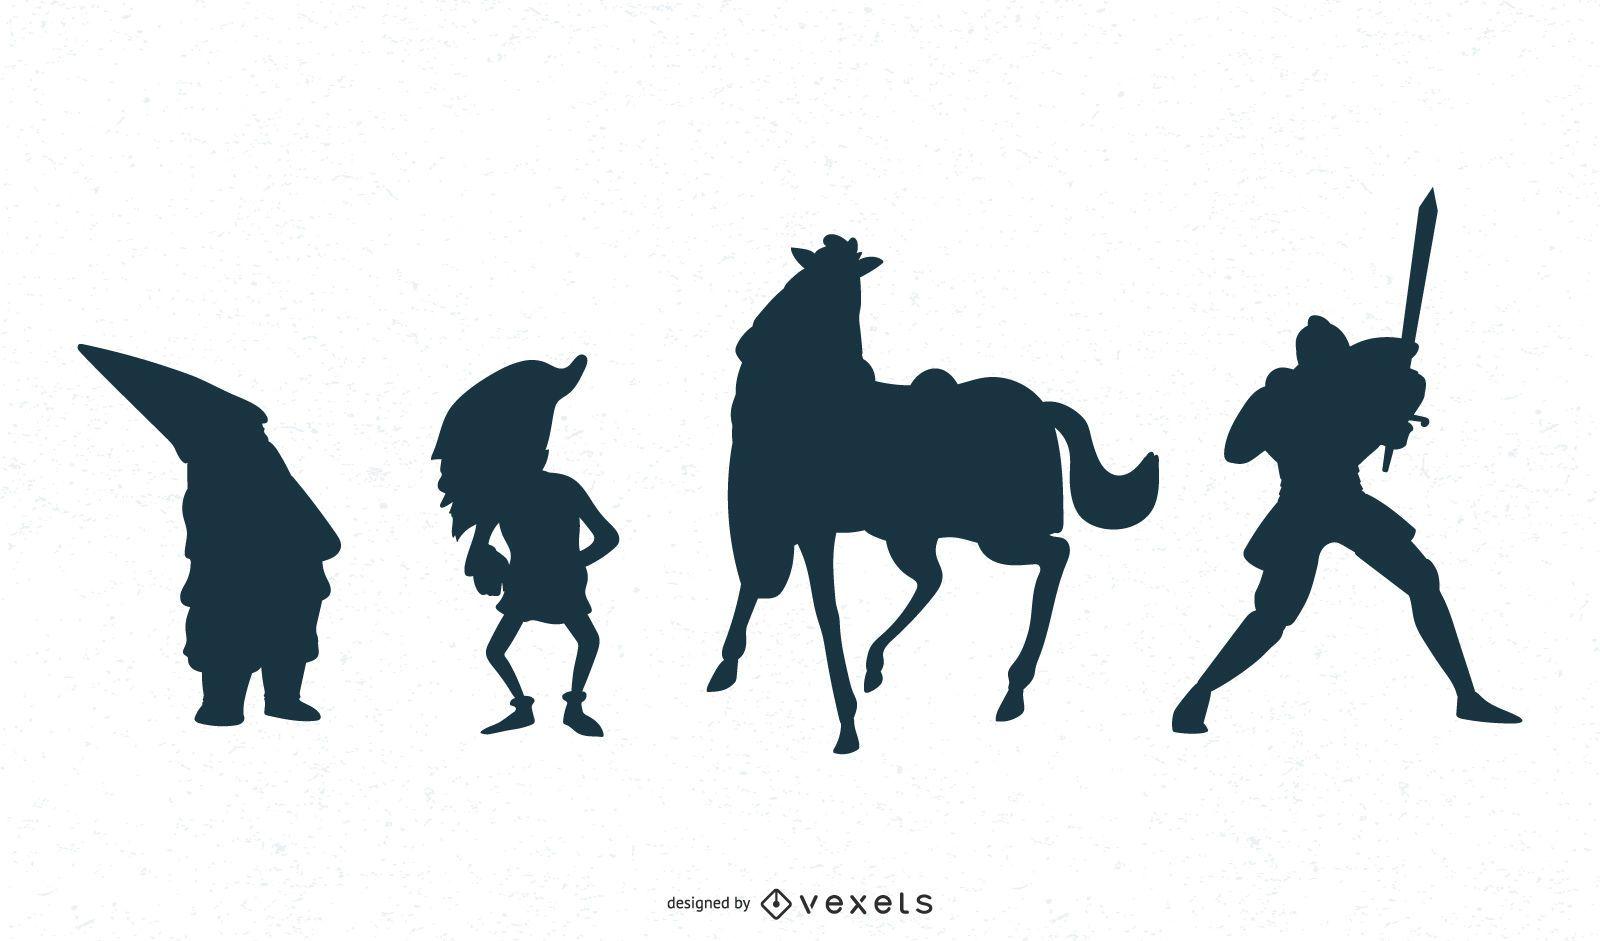 Fantasy Character Silhouette Design